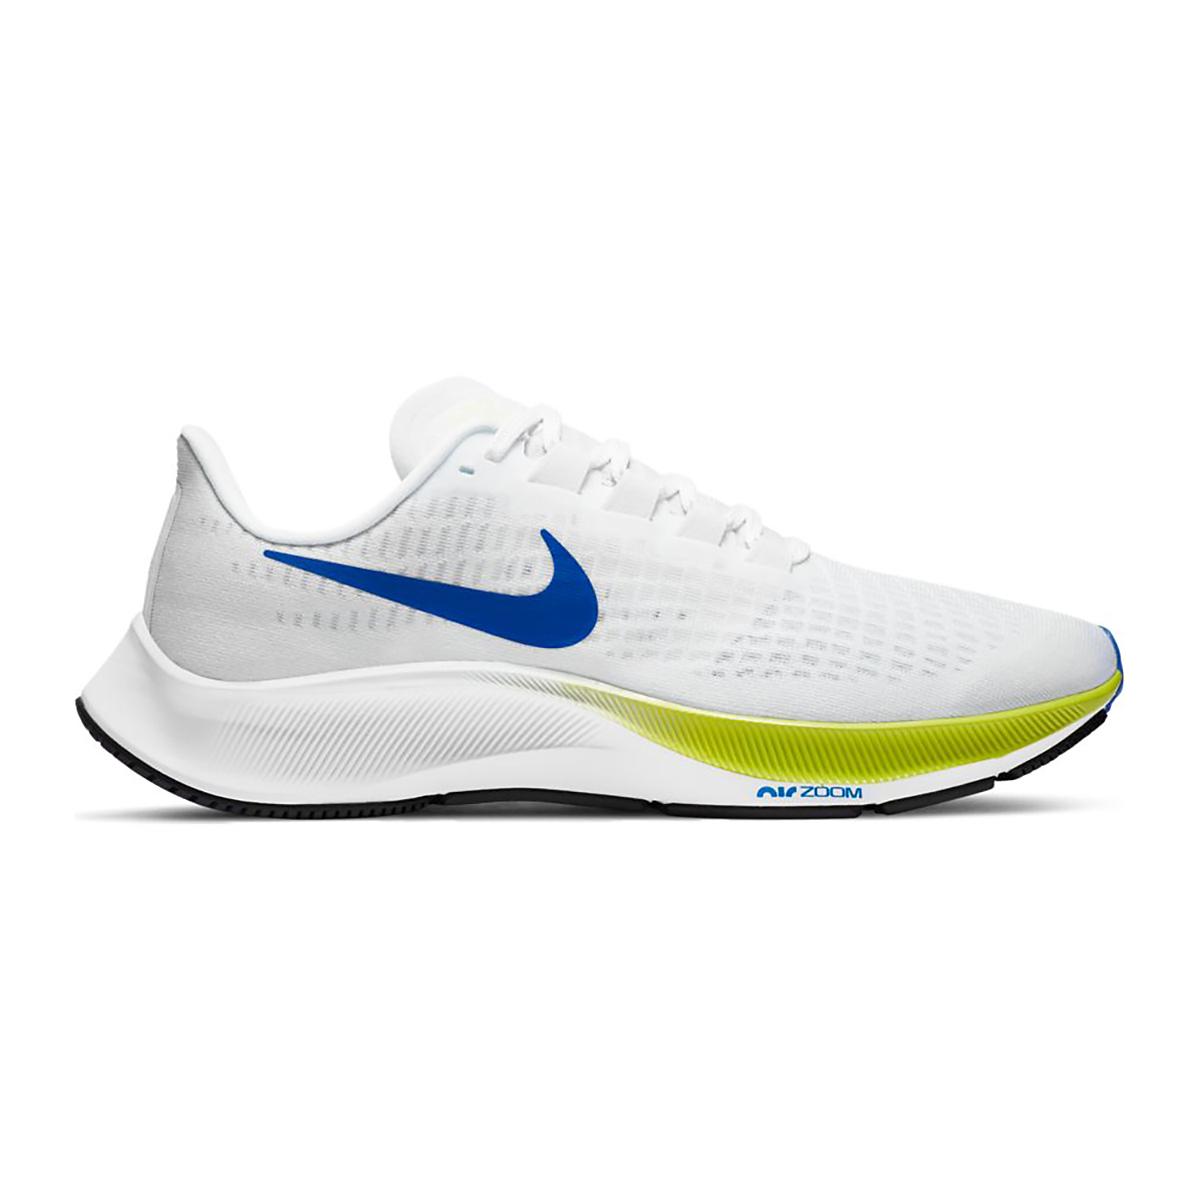 Men's Nike Air Zoom Pegasus 37 Running Shoe - Color: White/Racer Blue/Cyber/Black - Size: 6 - Width: Regular, White/Racer Blue/Cyber/Black, large, image 1